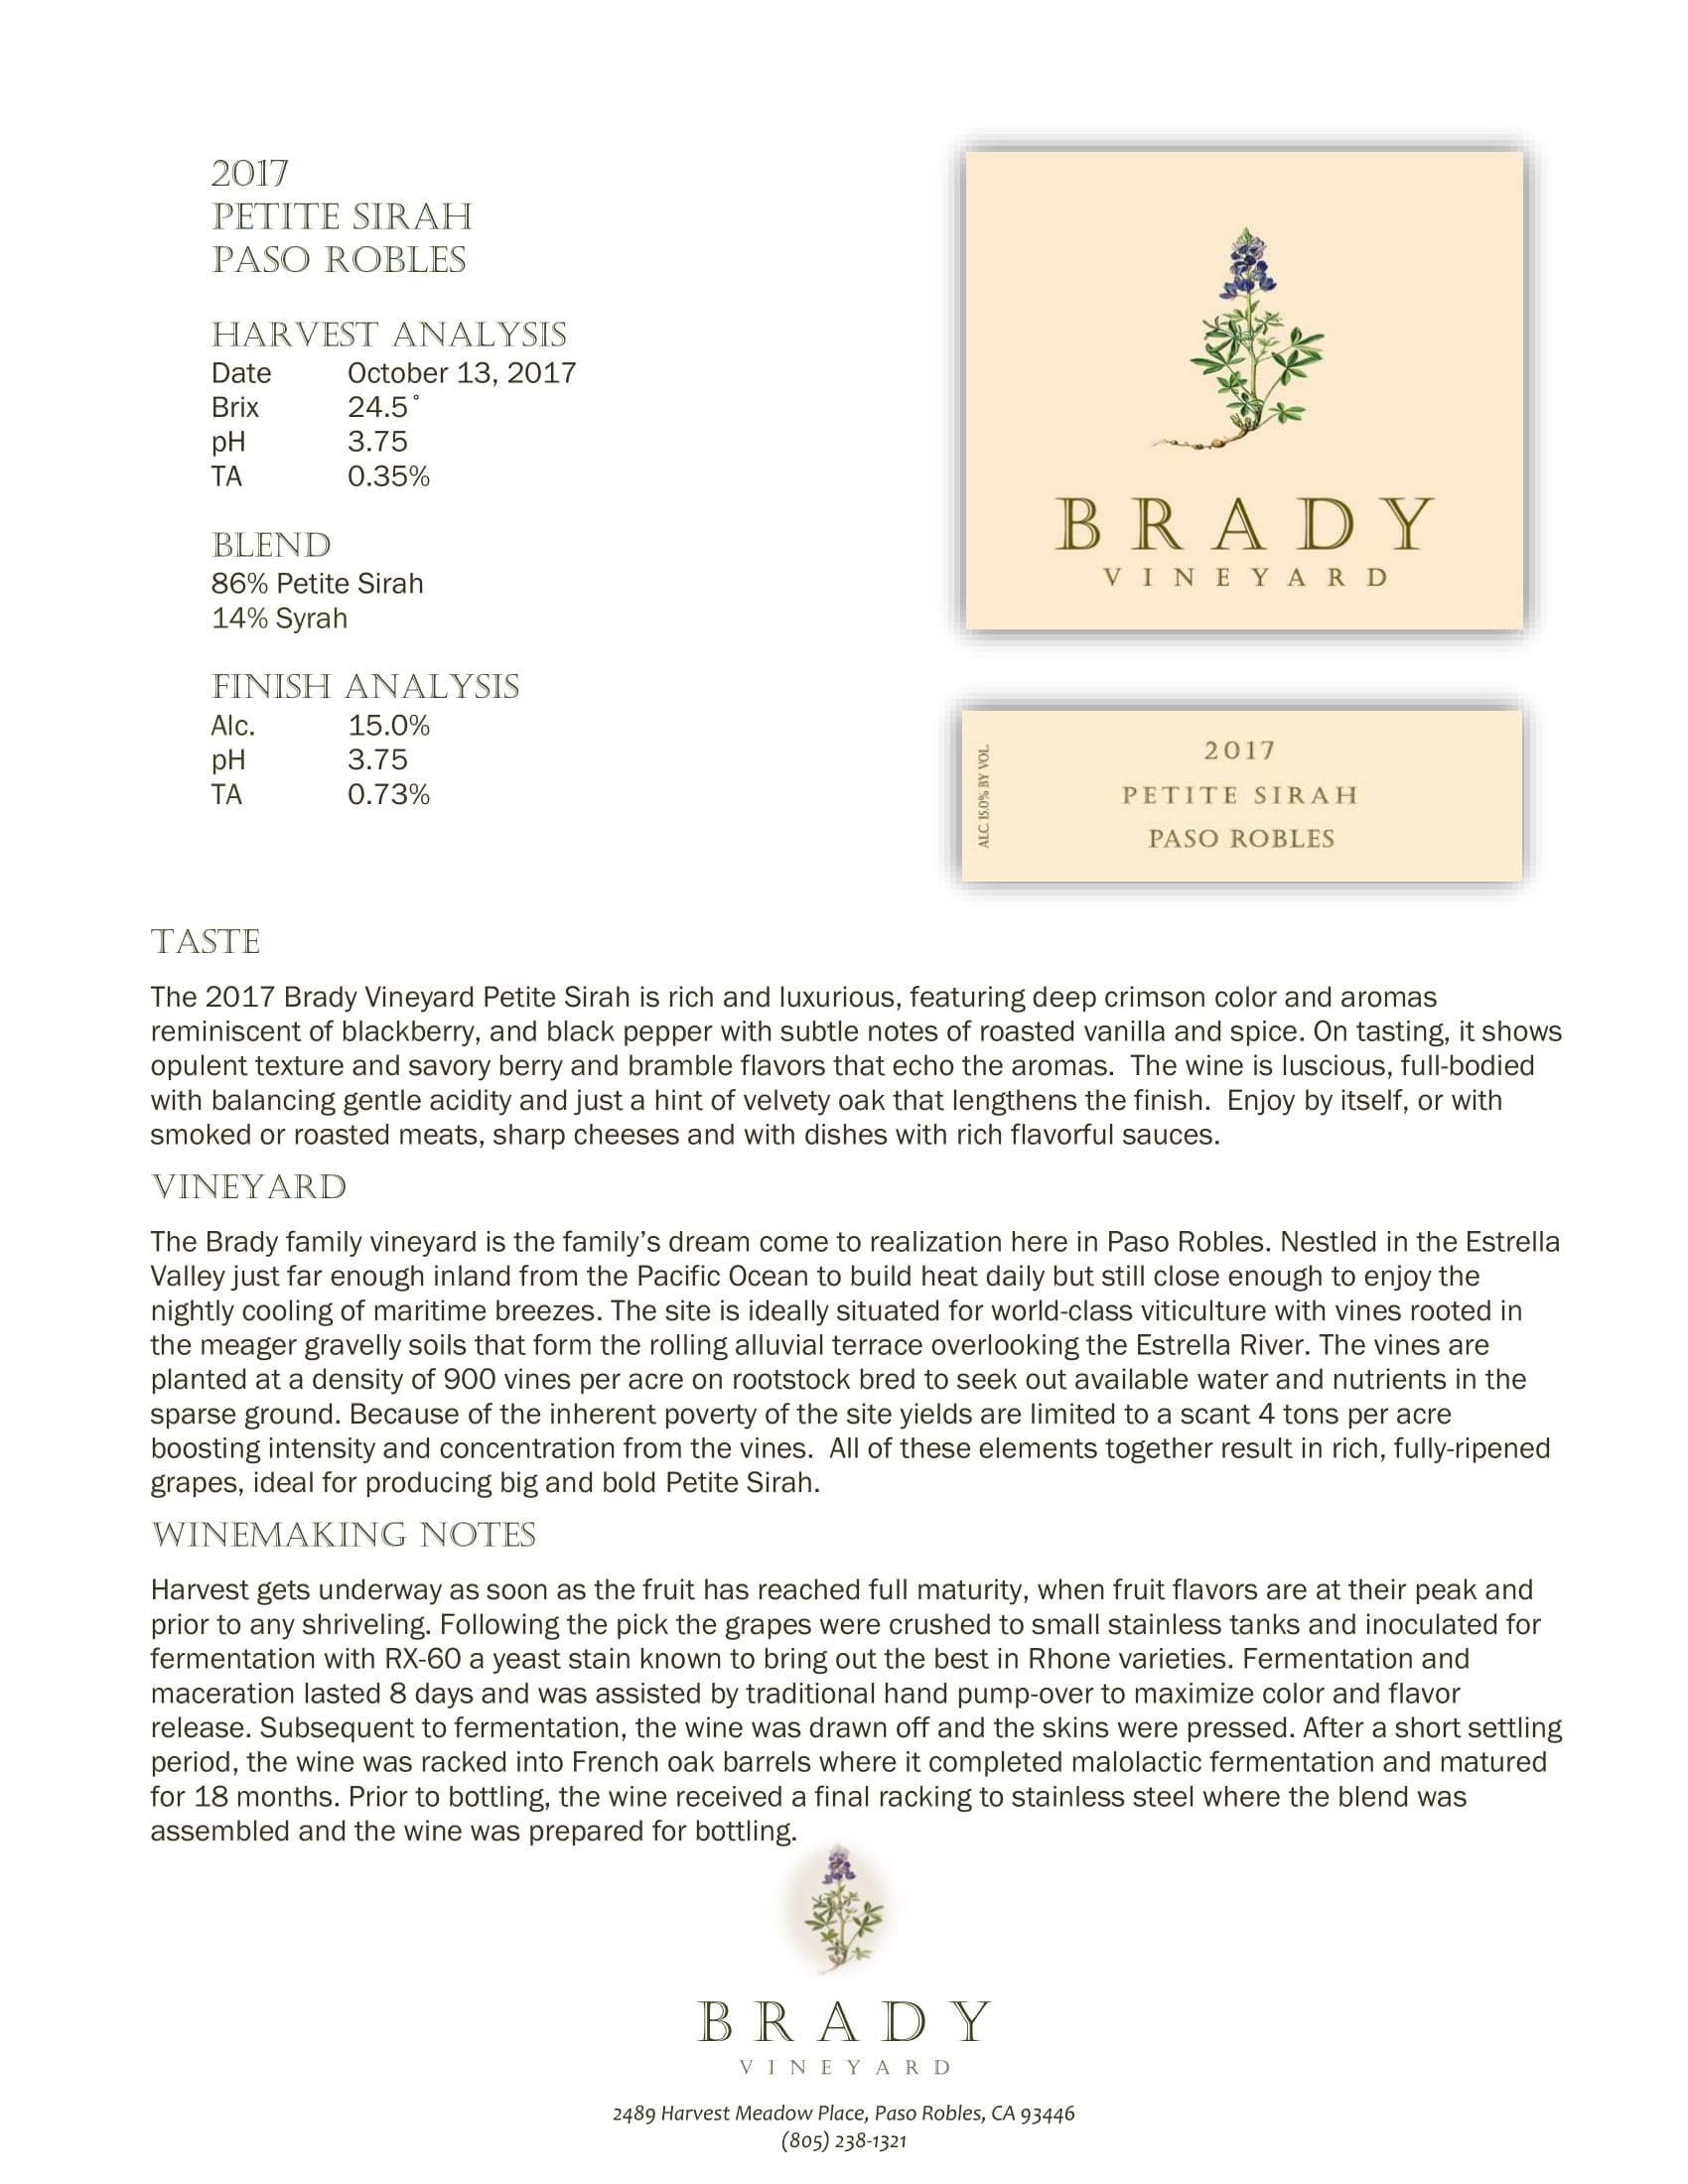 Brady Vineyards Petite Sirah Sell Sheet